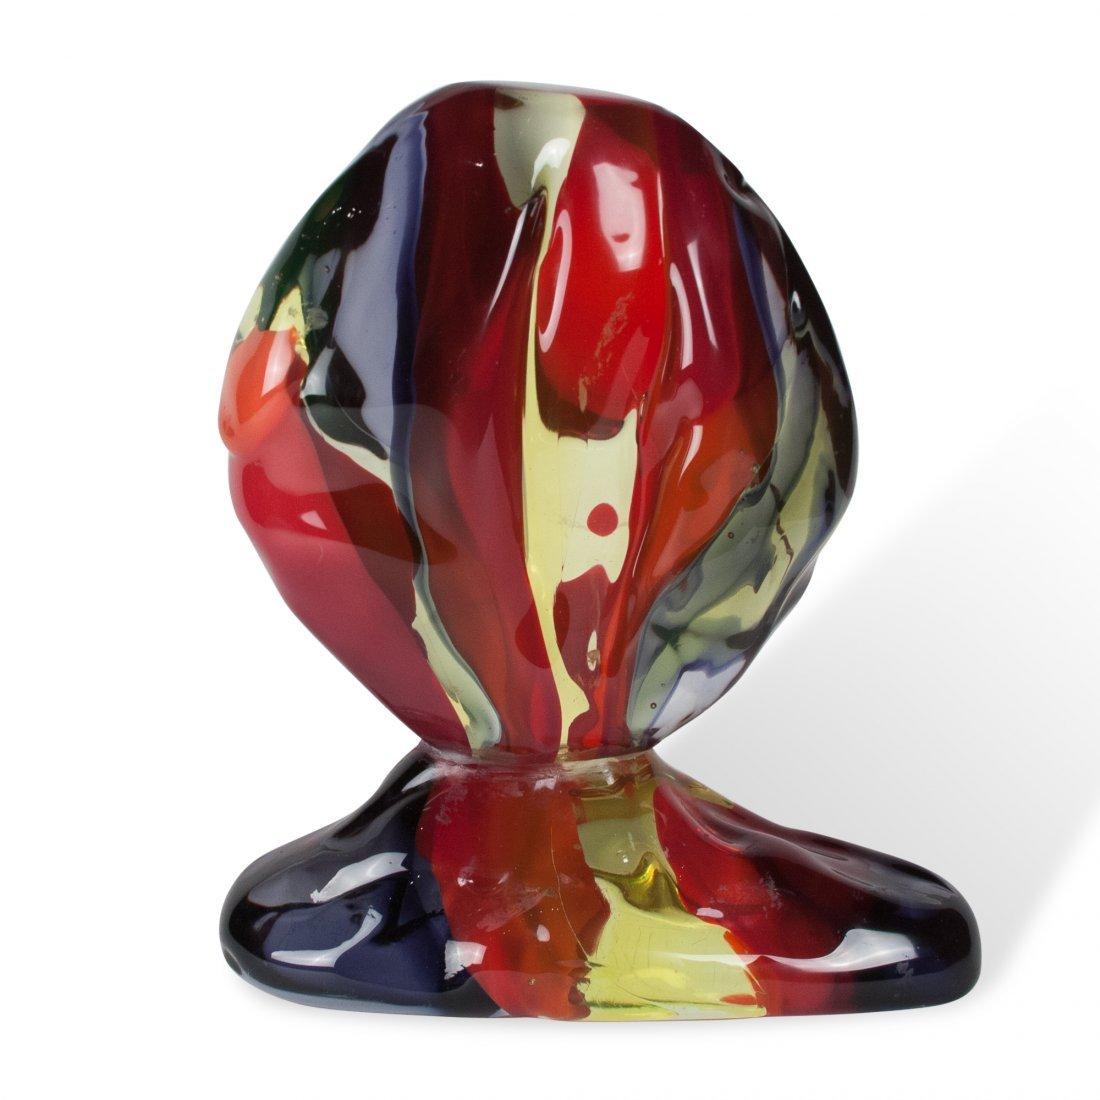 Luciano Gaspari Glass Sculpture (Repaired) - 4